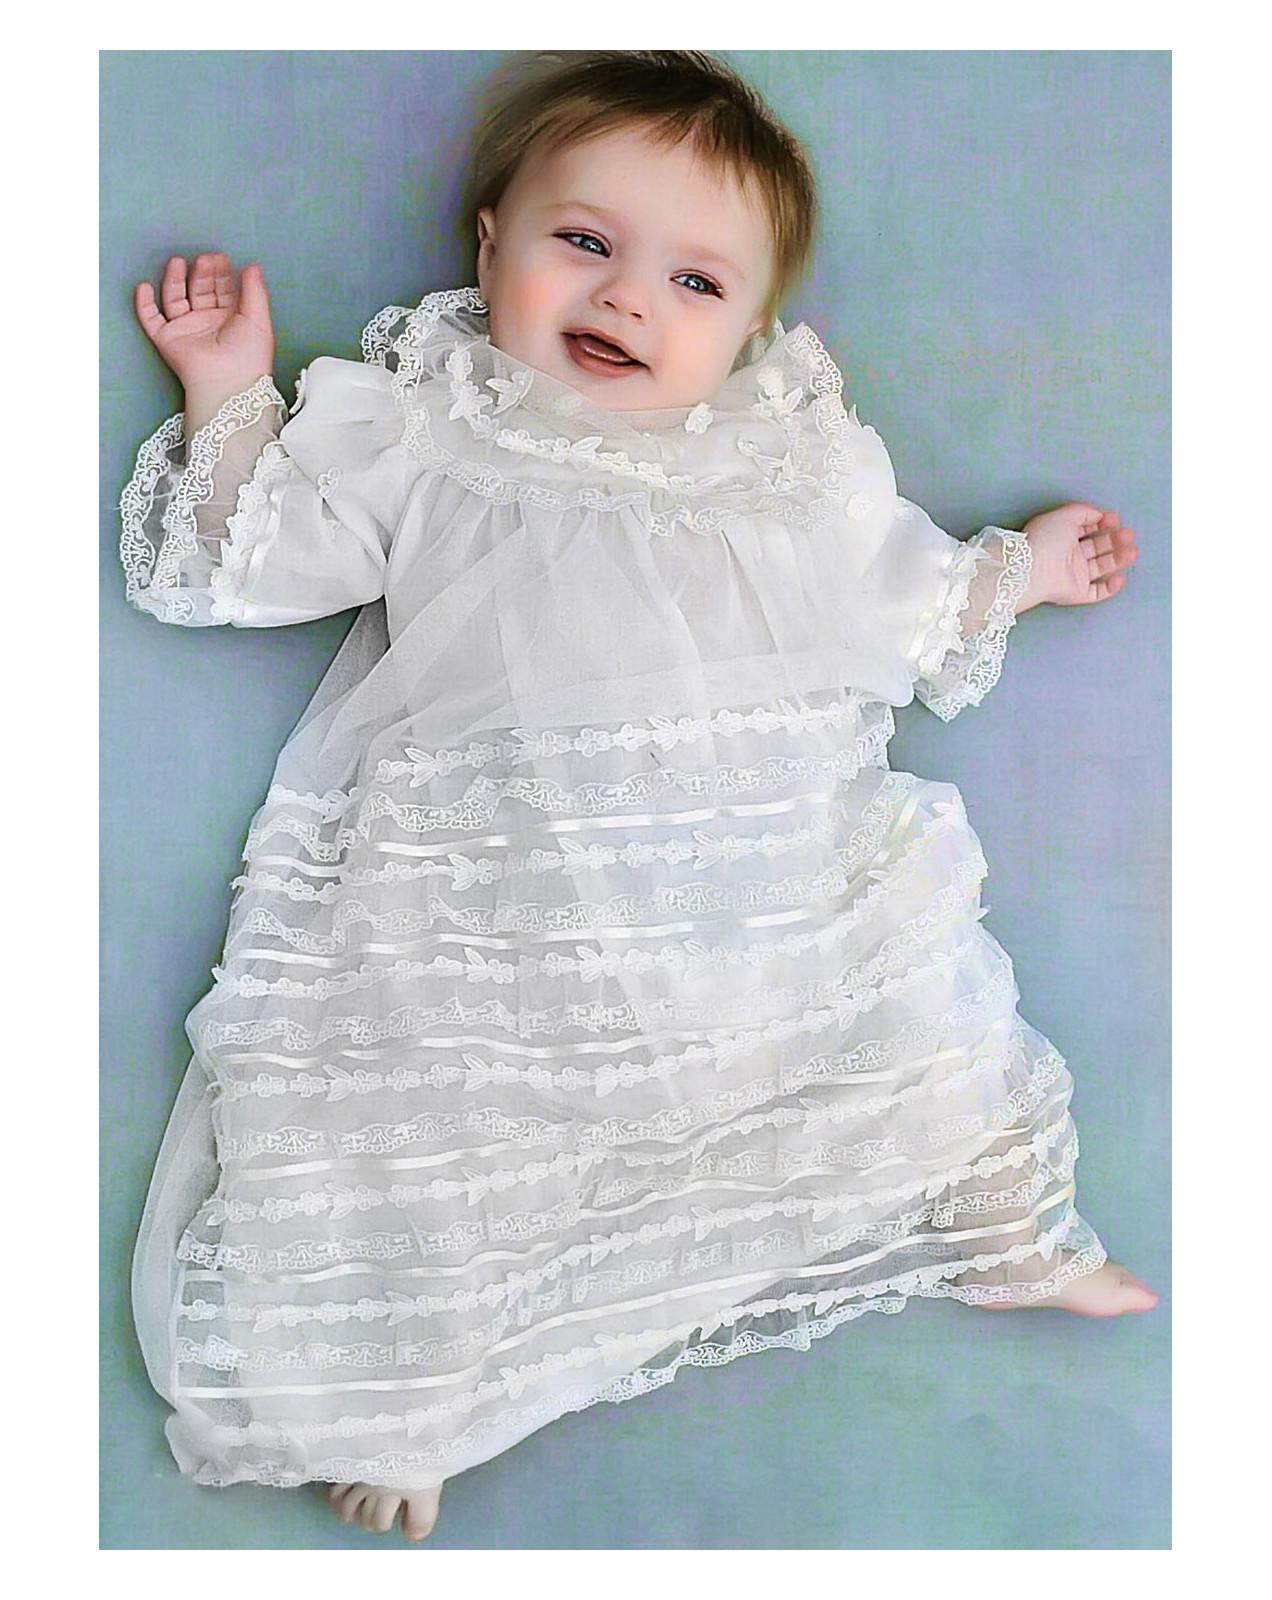 Laces christening and cerimony Jessenia